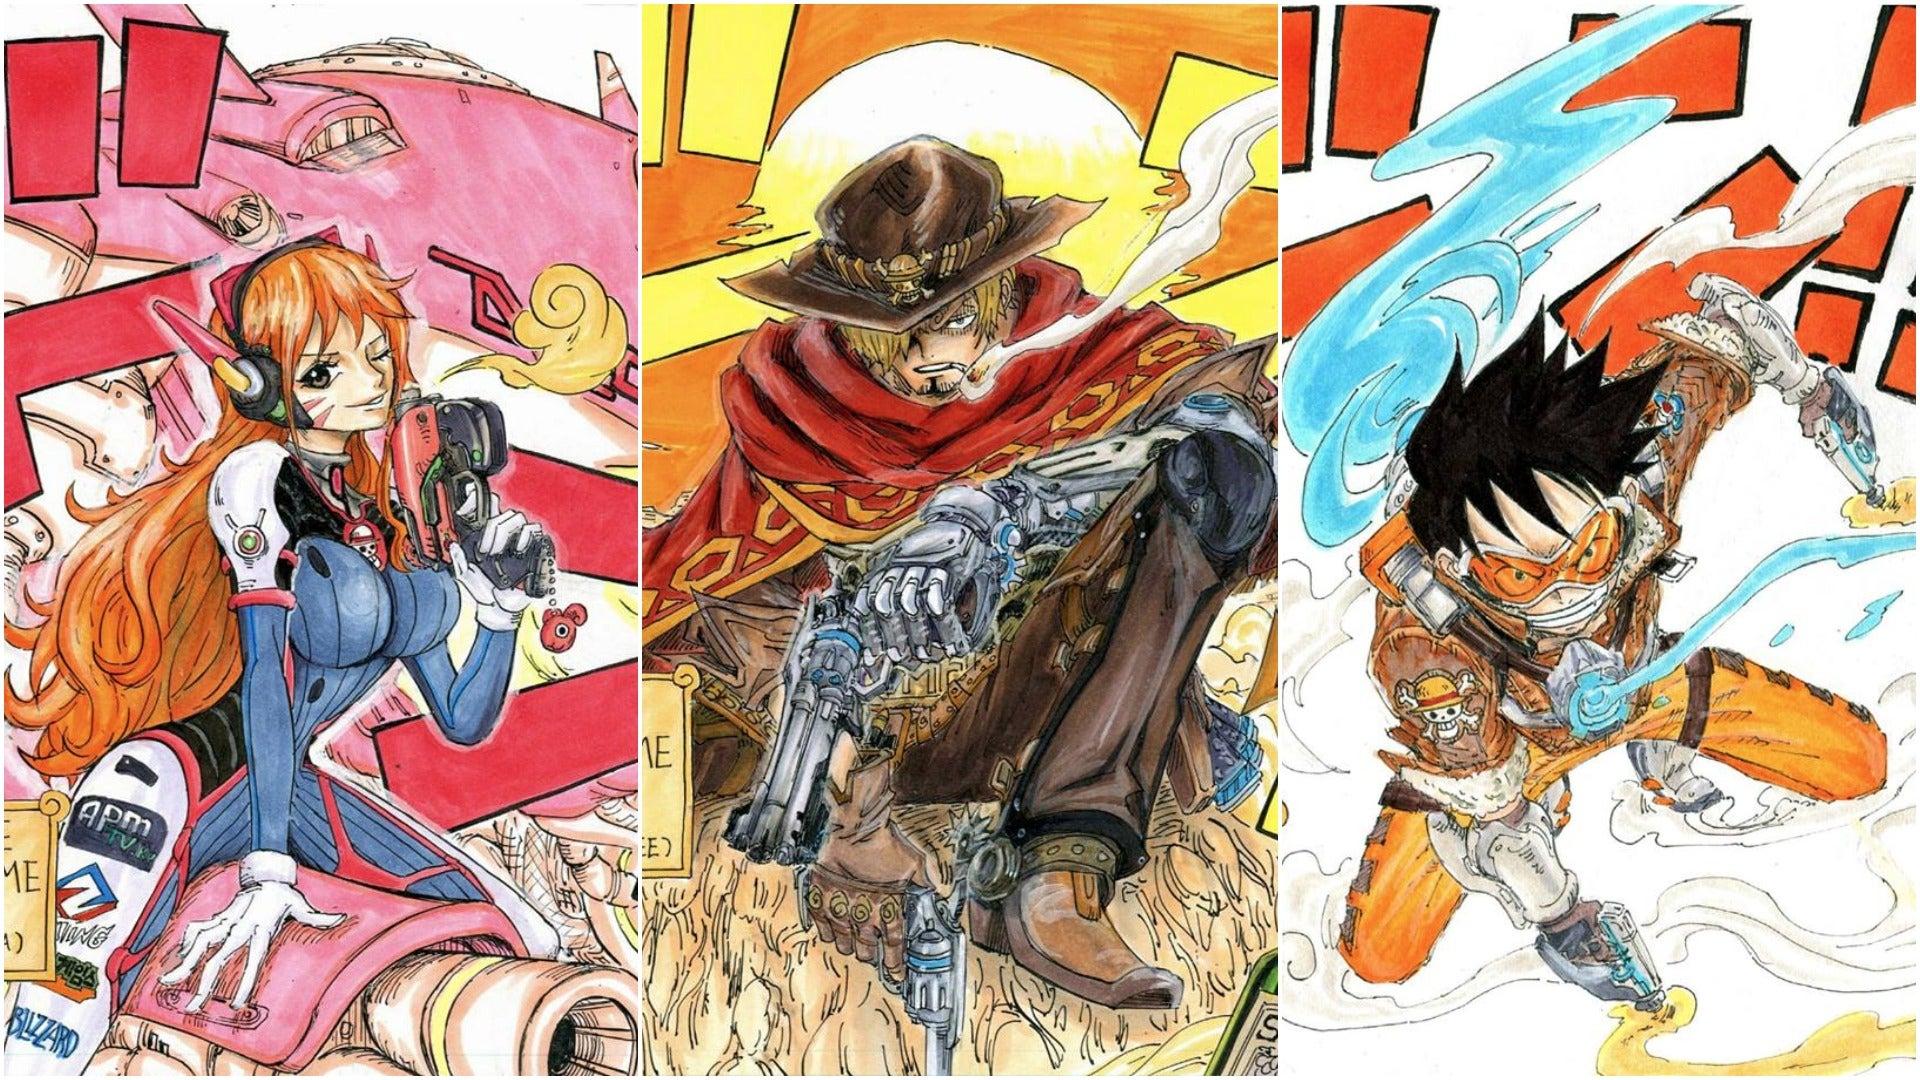 art fan-art manga one-piece overwatch south-korea